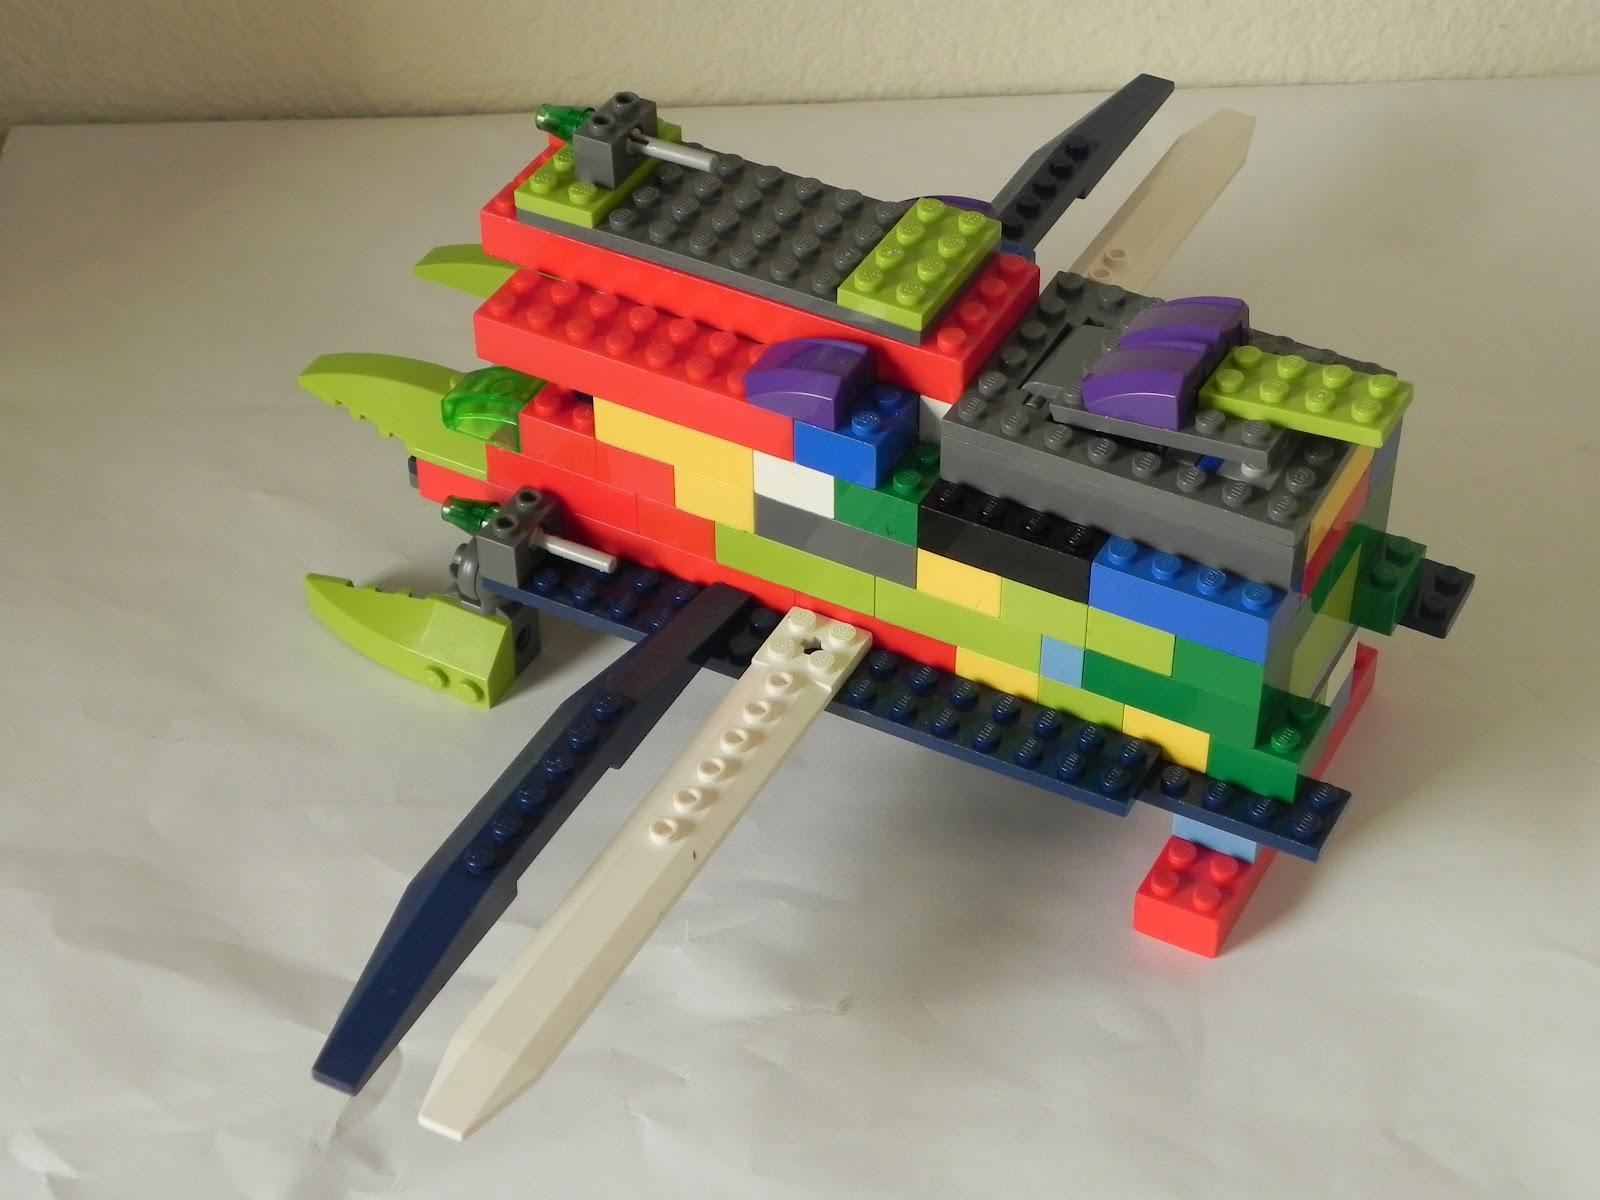 Samarth S Awesome Legos Samarth S Awesome Lego Creations